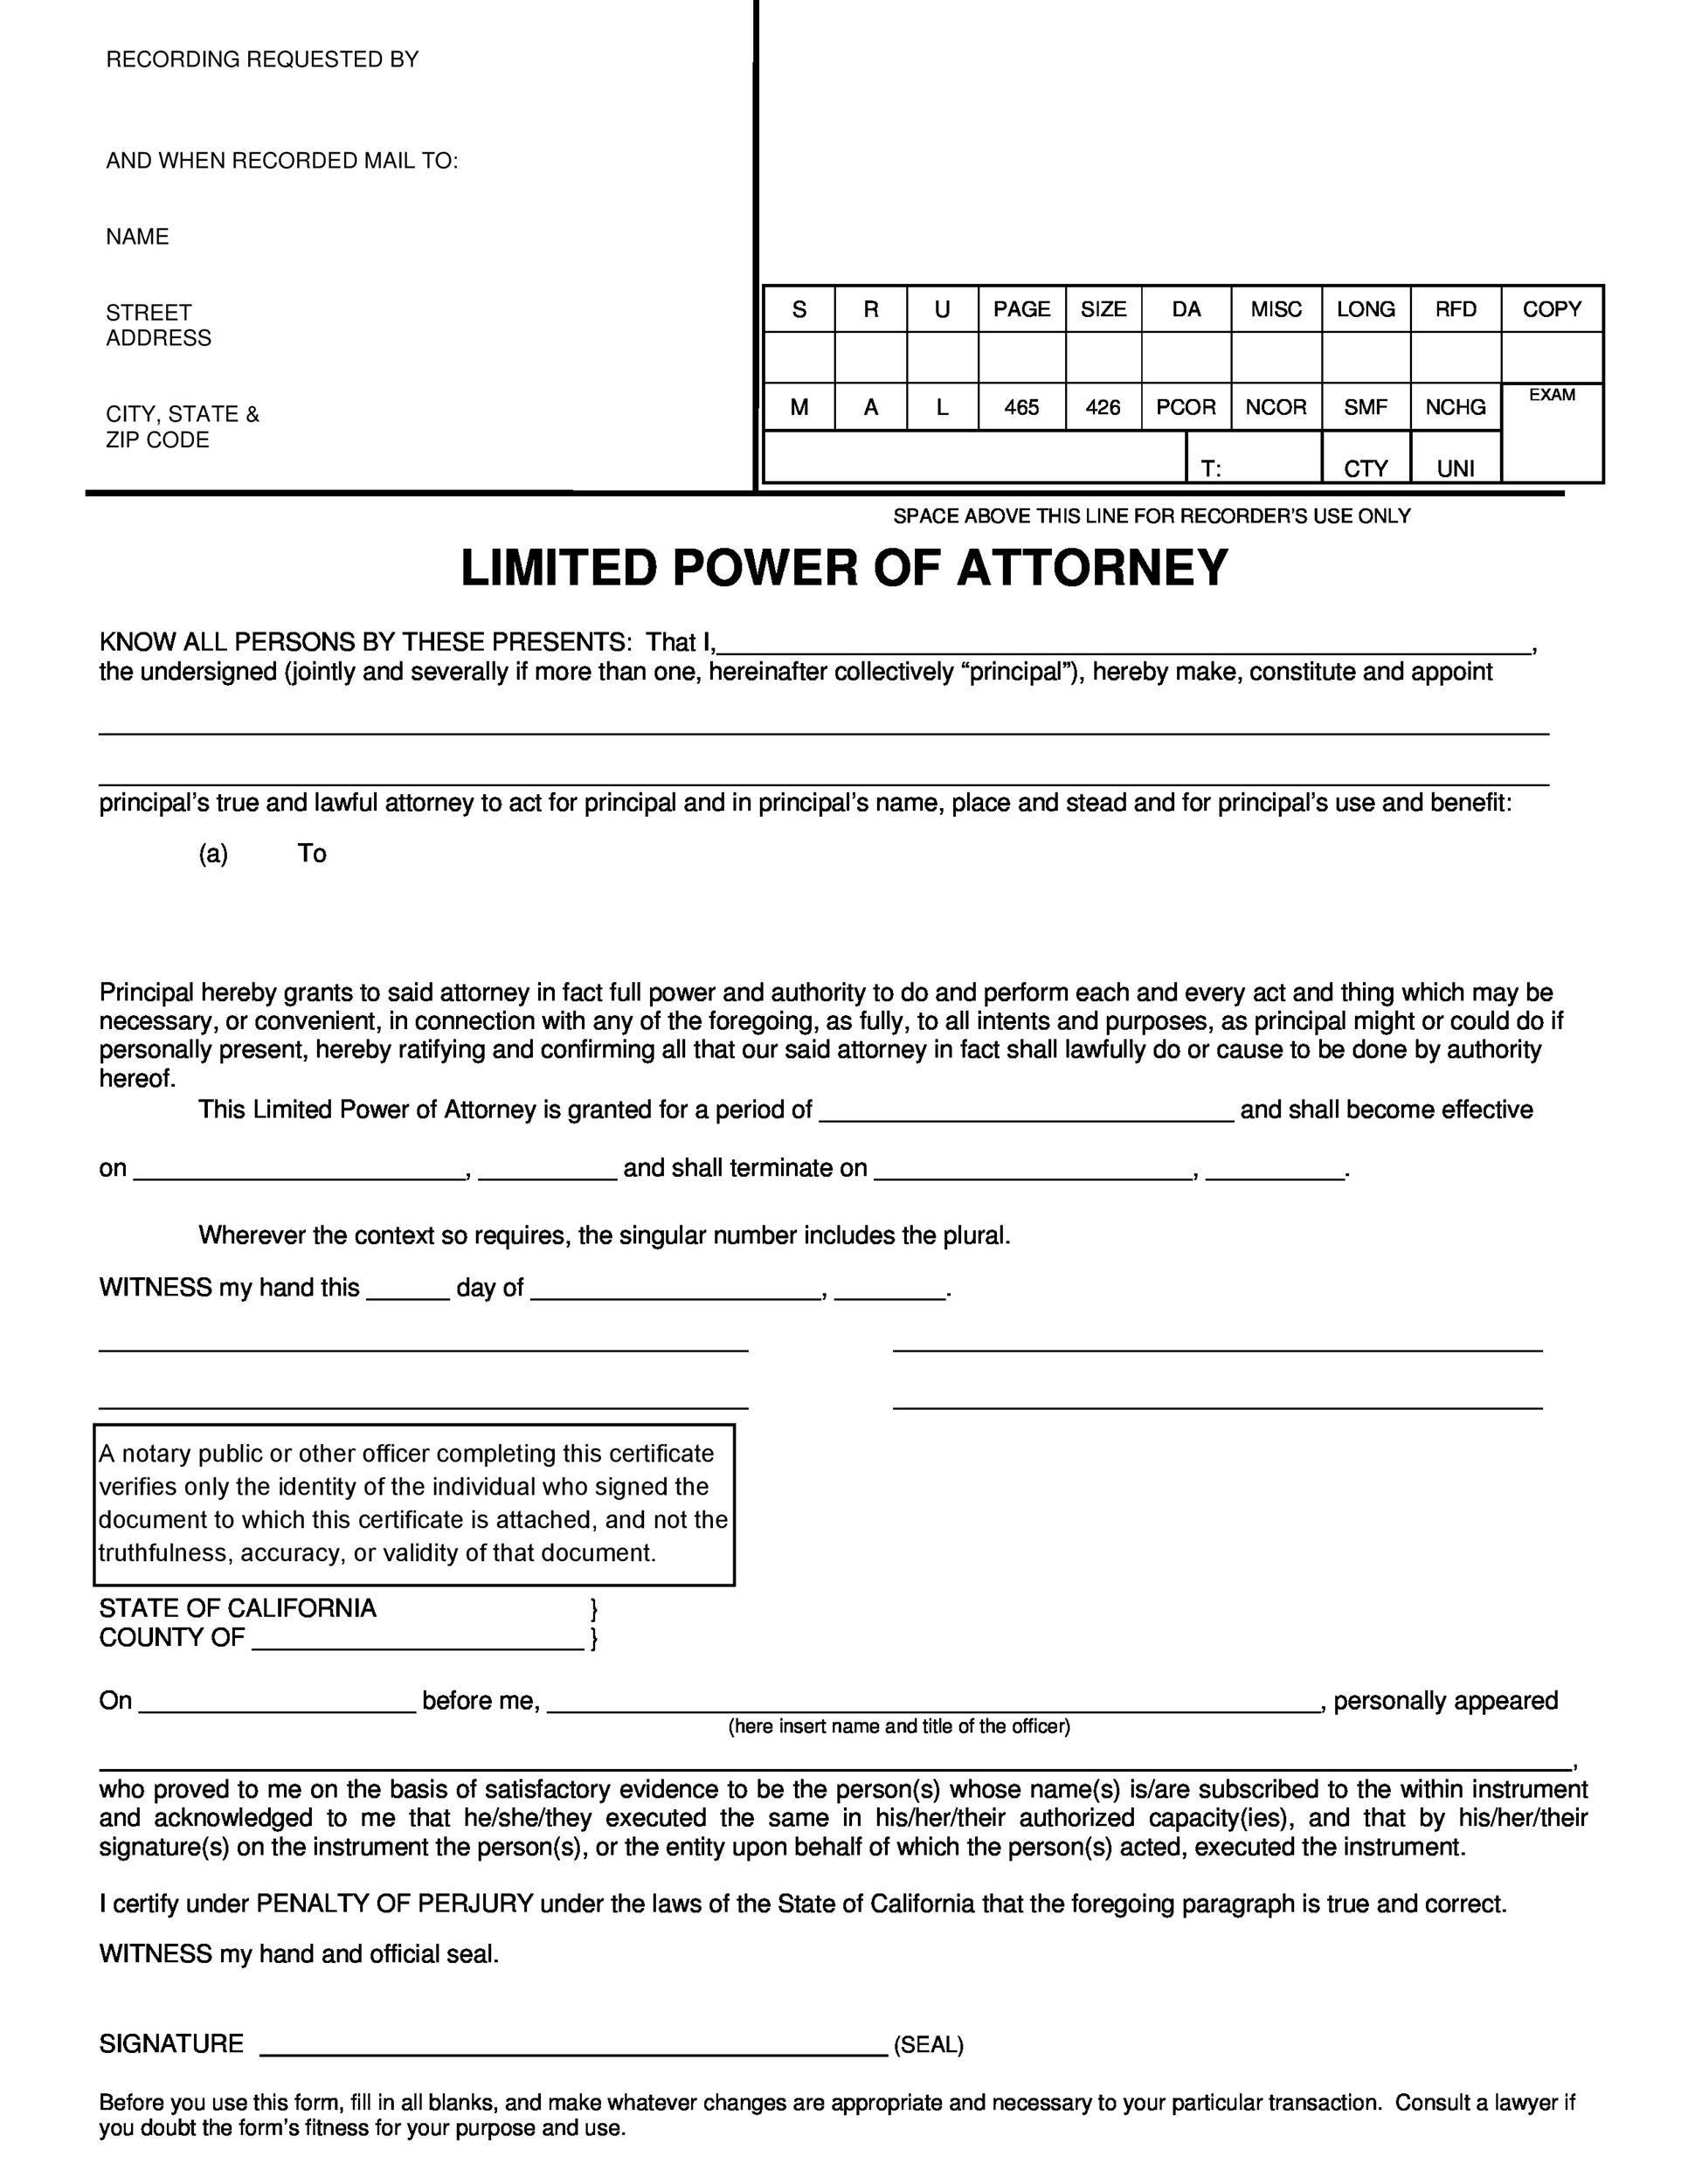 Free power of attorney 26